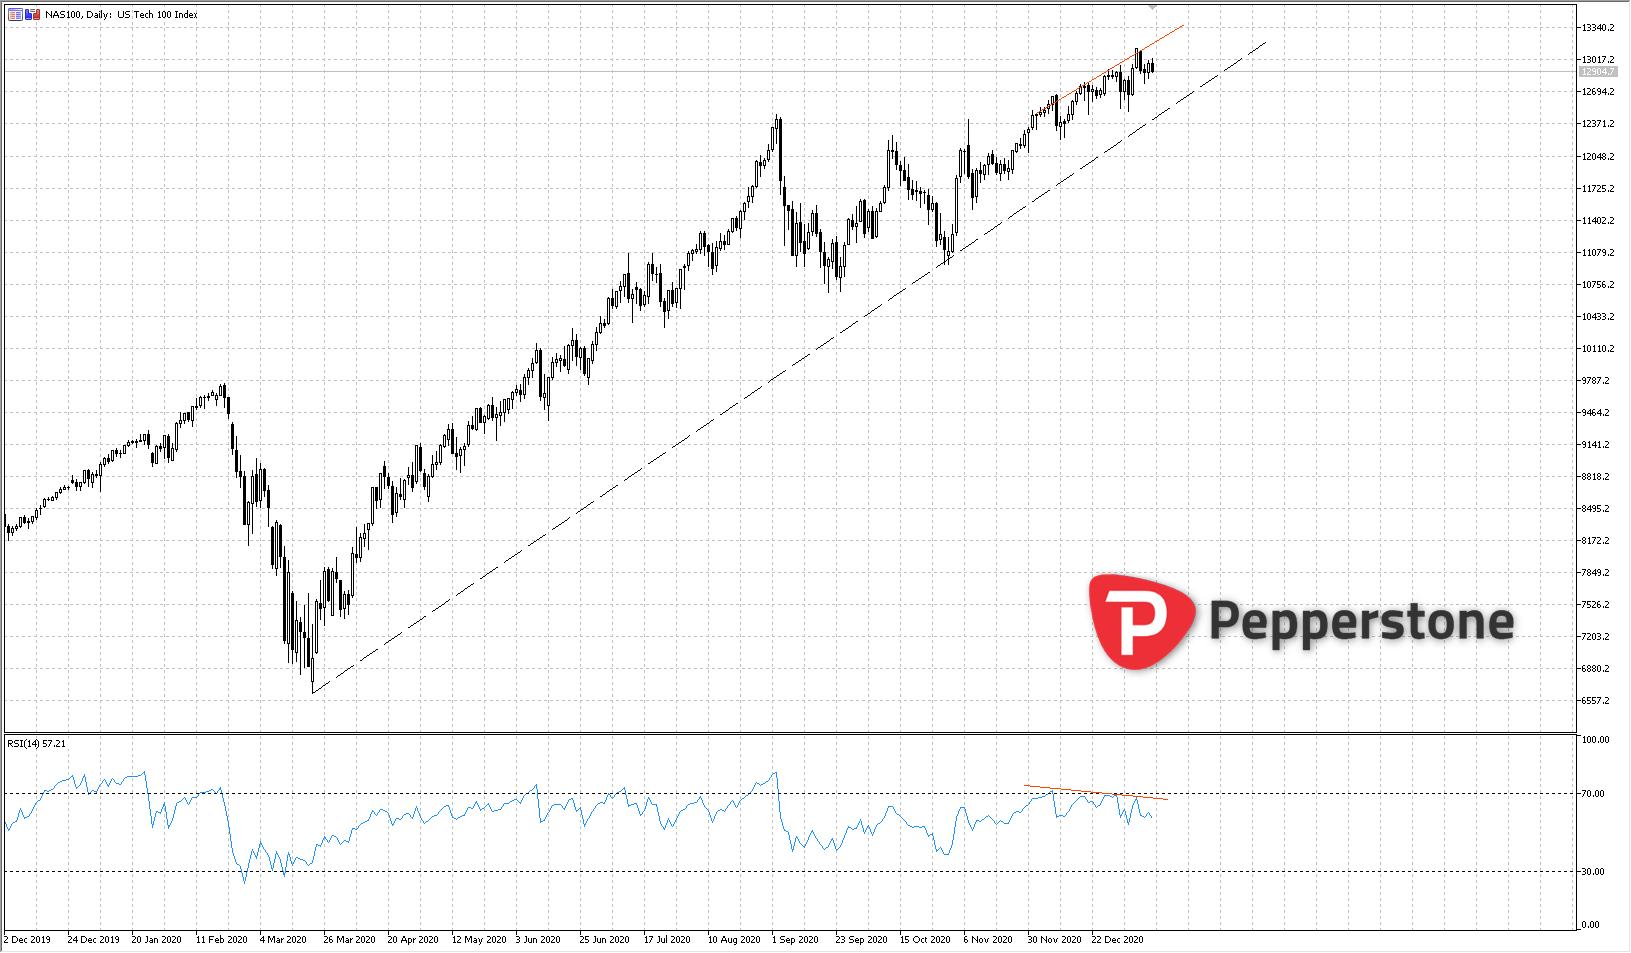 NASDAQ_100_Diario.png